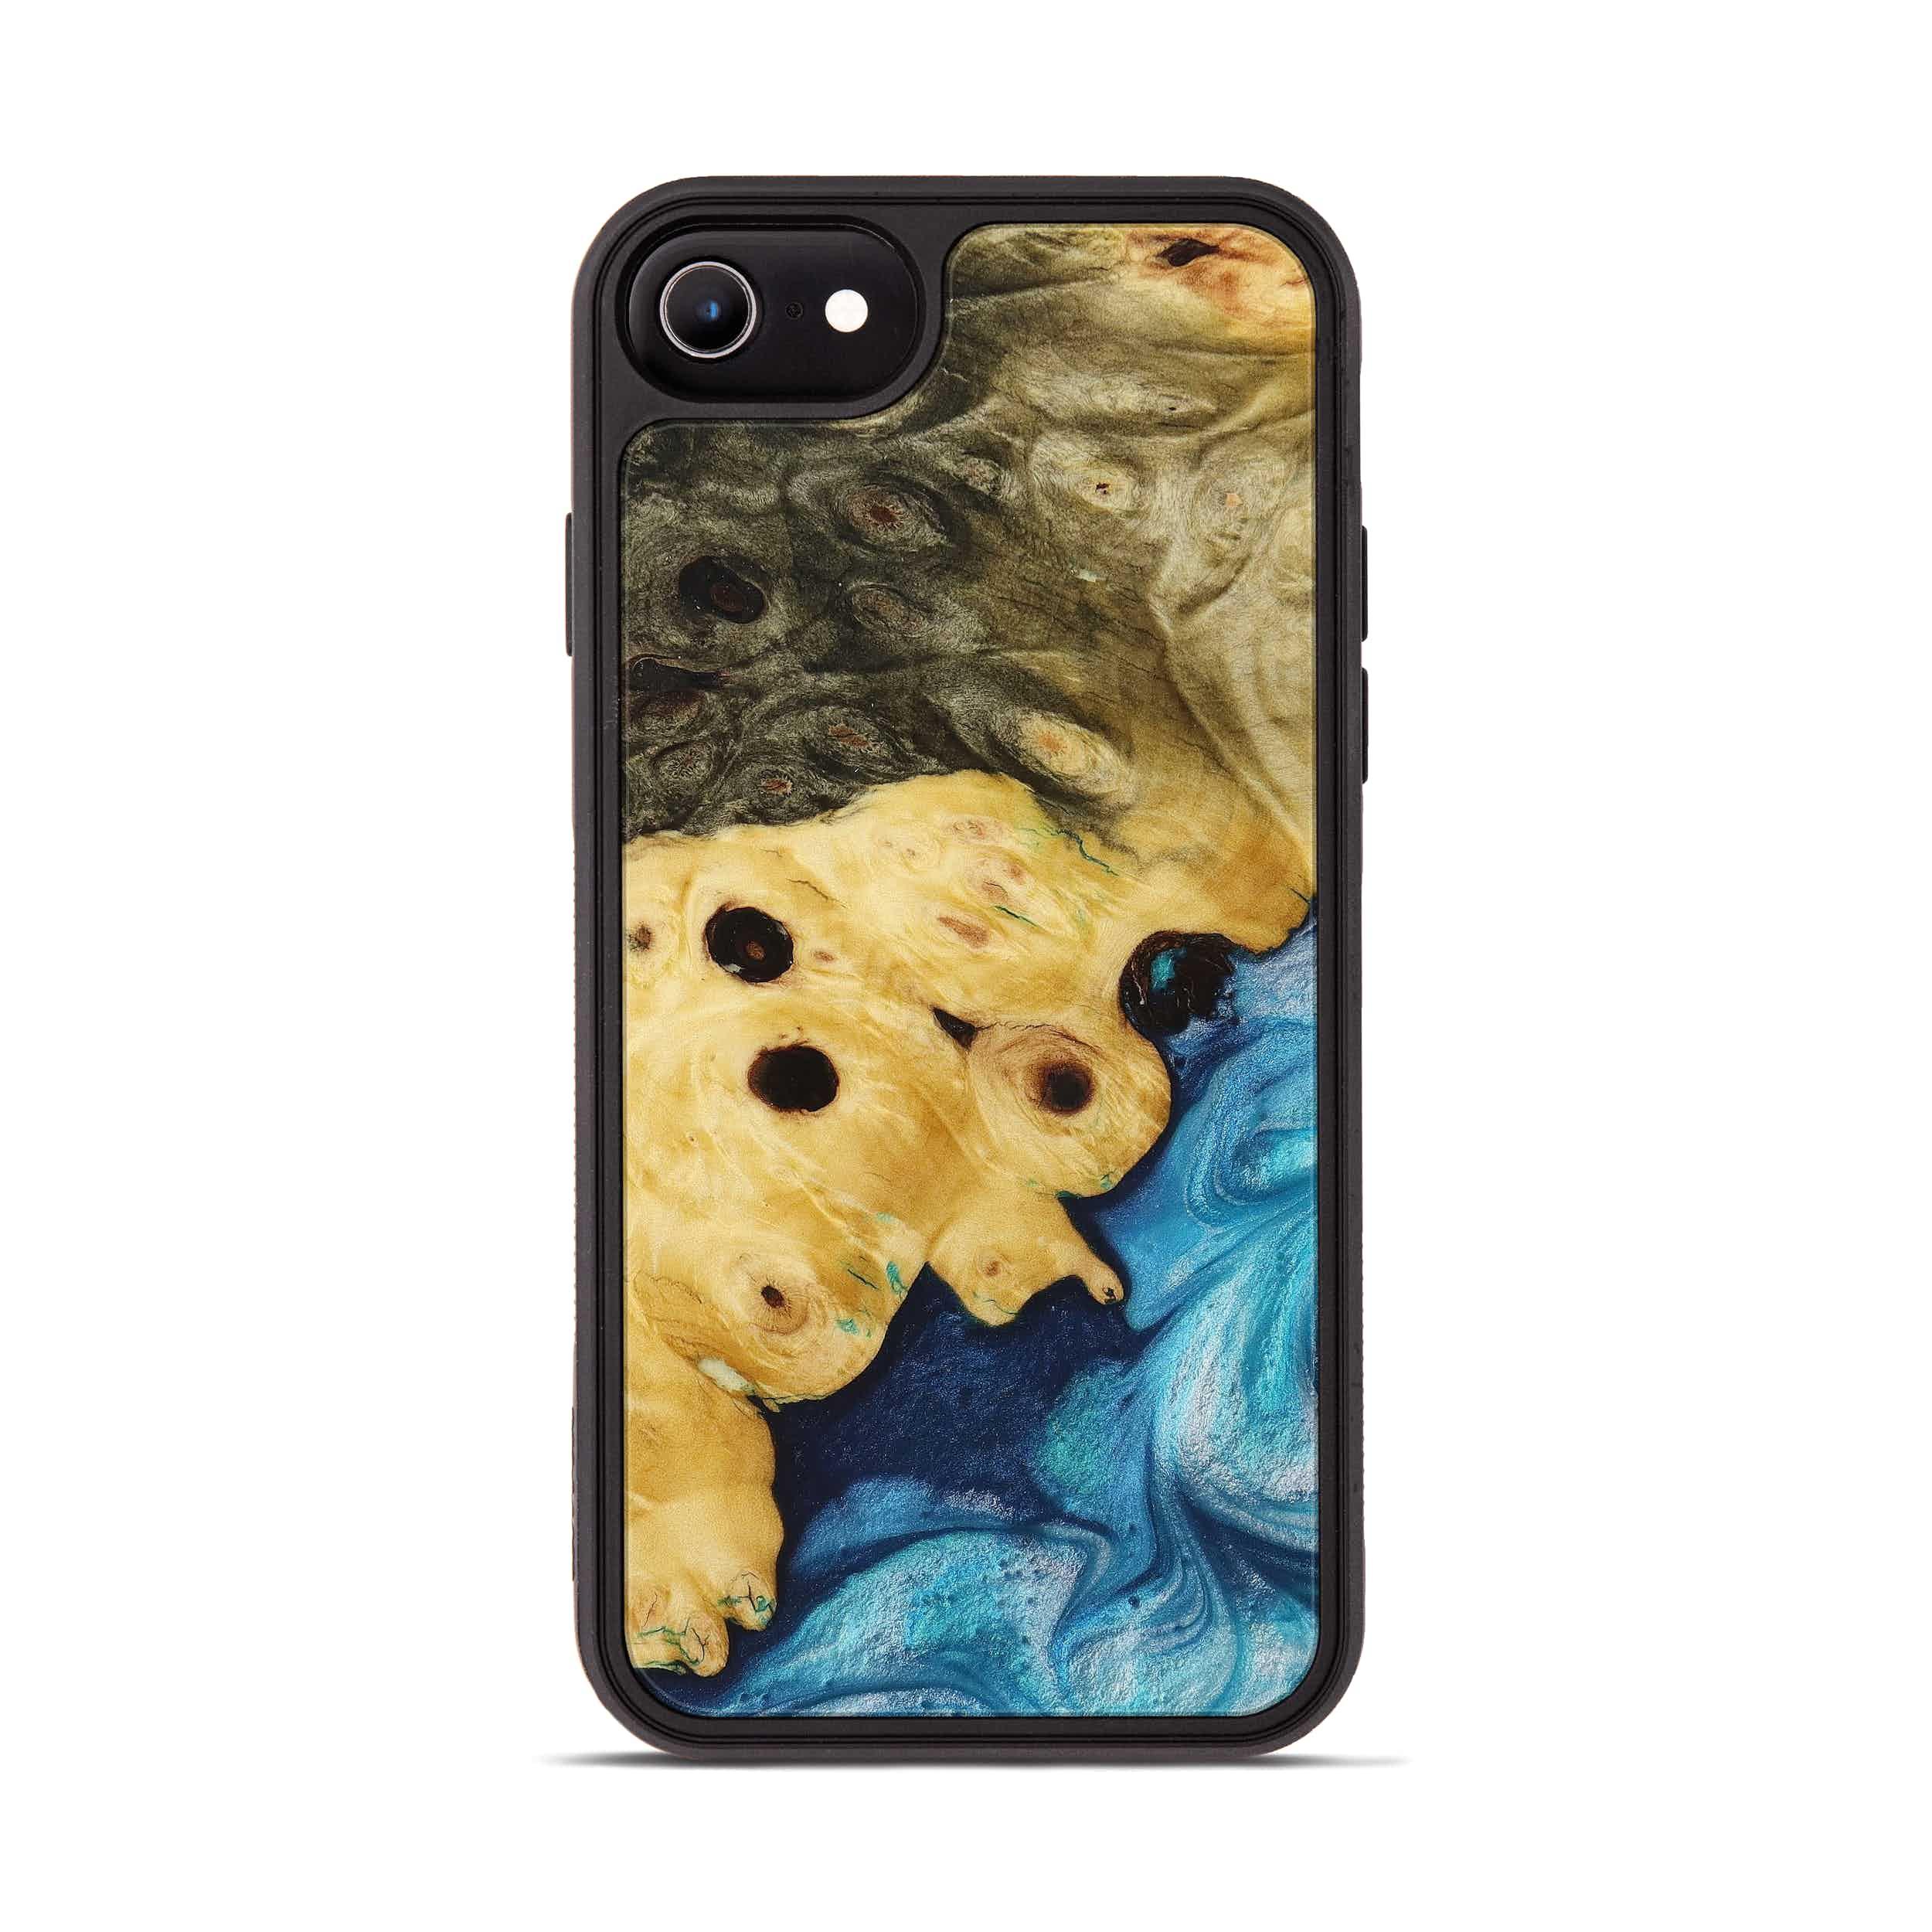 iPhone 8 Wood+Resin Phone Case - Agnella (Light Blue, 394205)